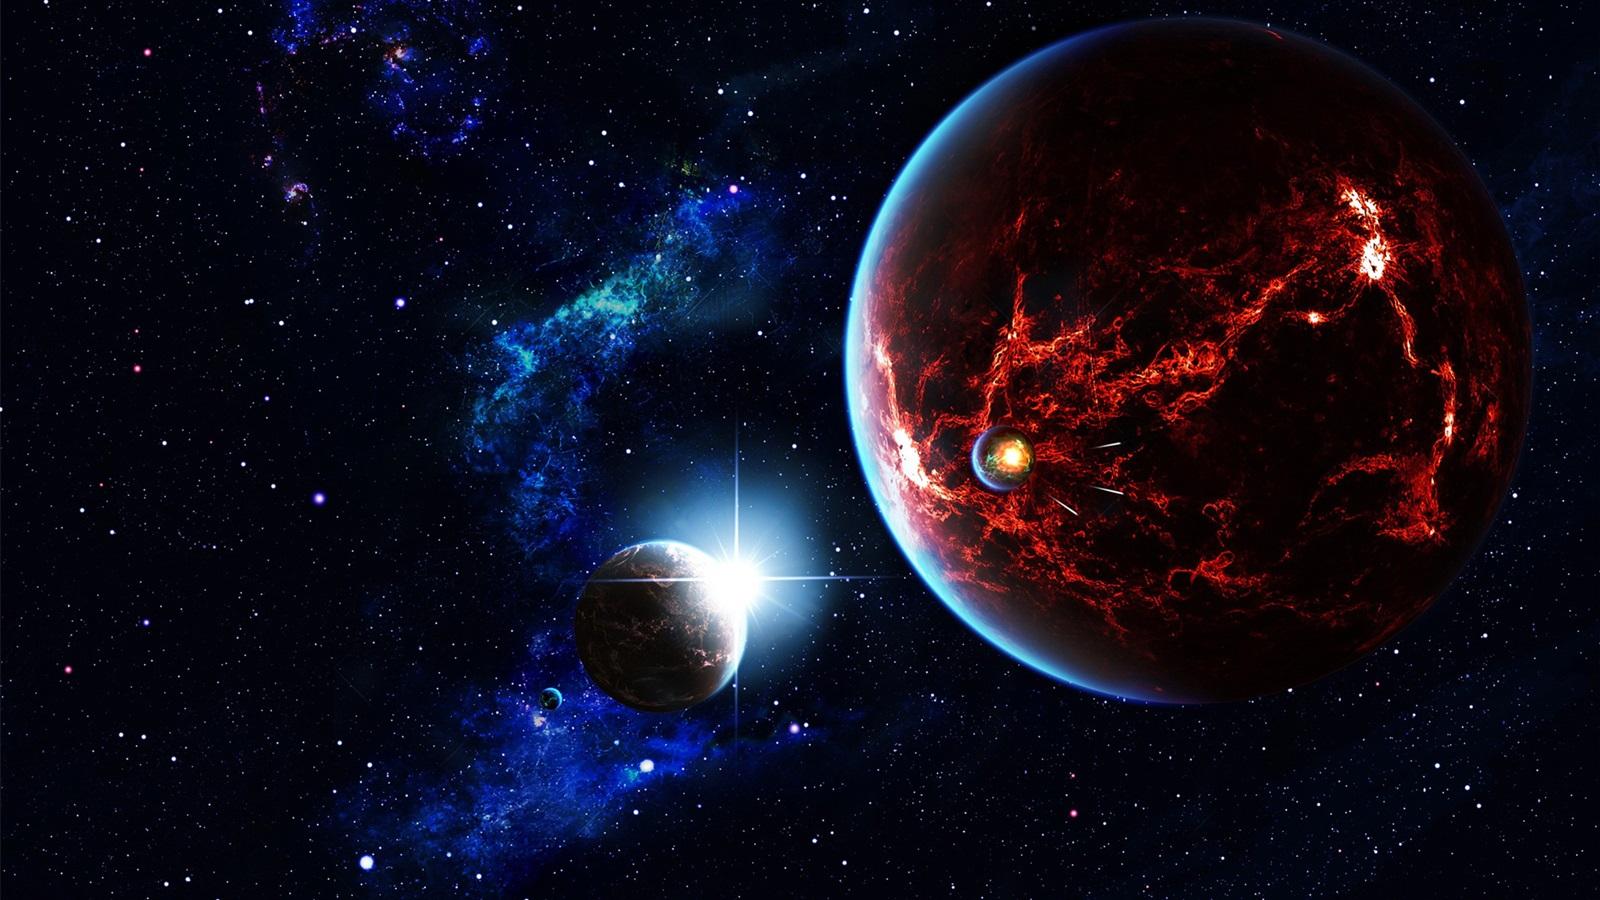 Space stars universe planet satellite nebula - Space wallpaper 1600x900 ...